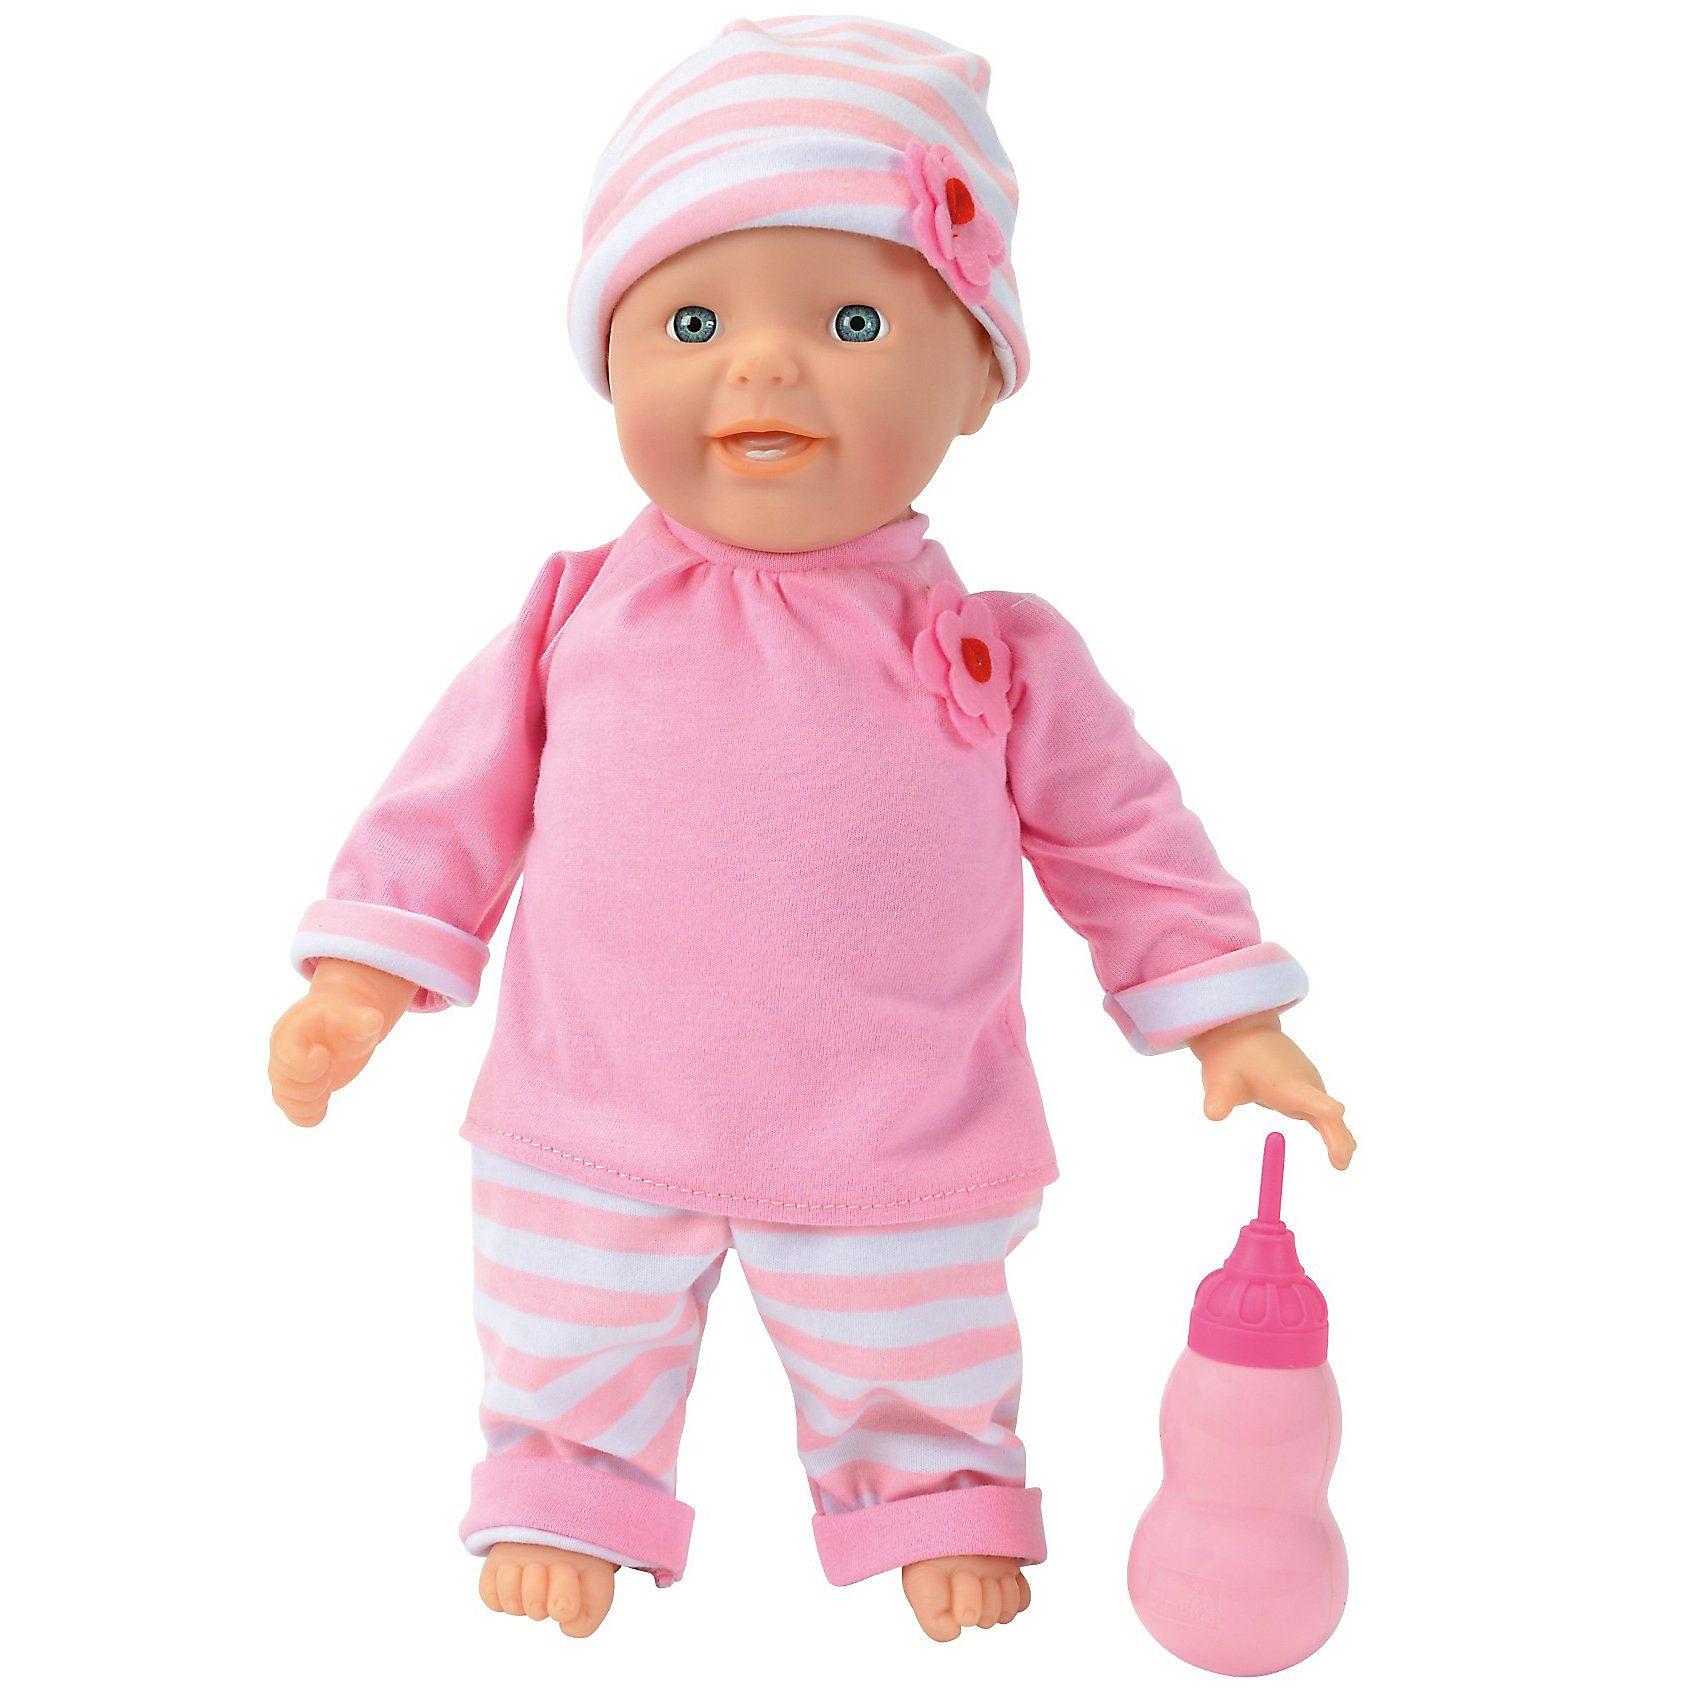 Simba Babypuppe Laura Happy, 38 cm